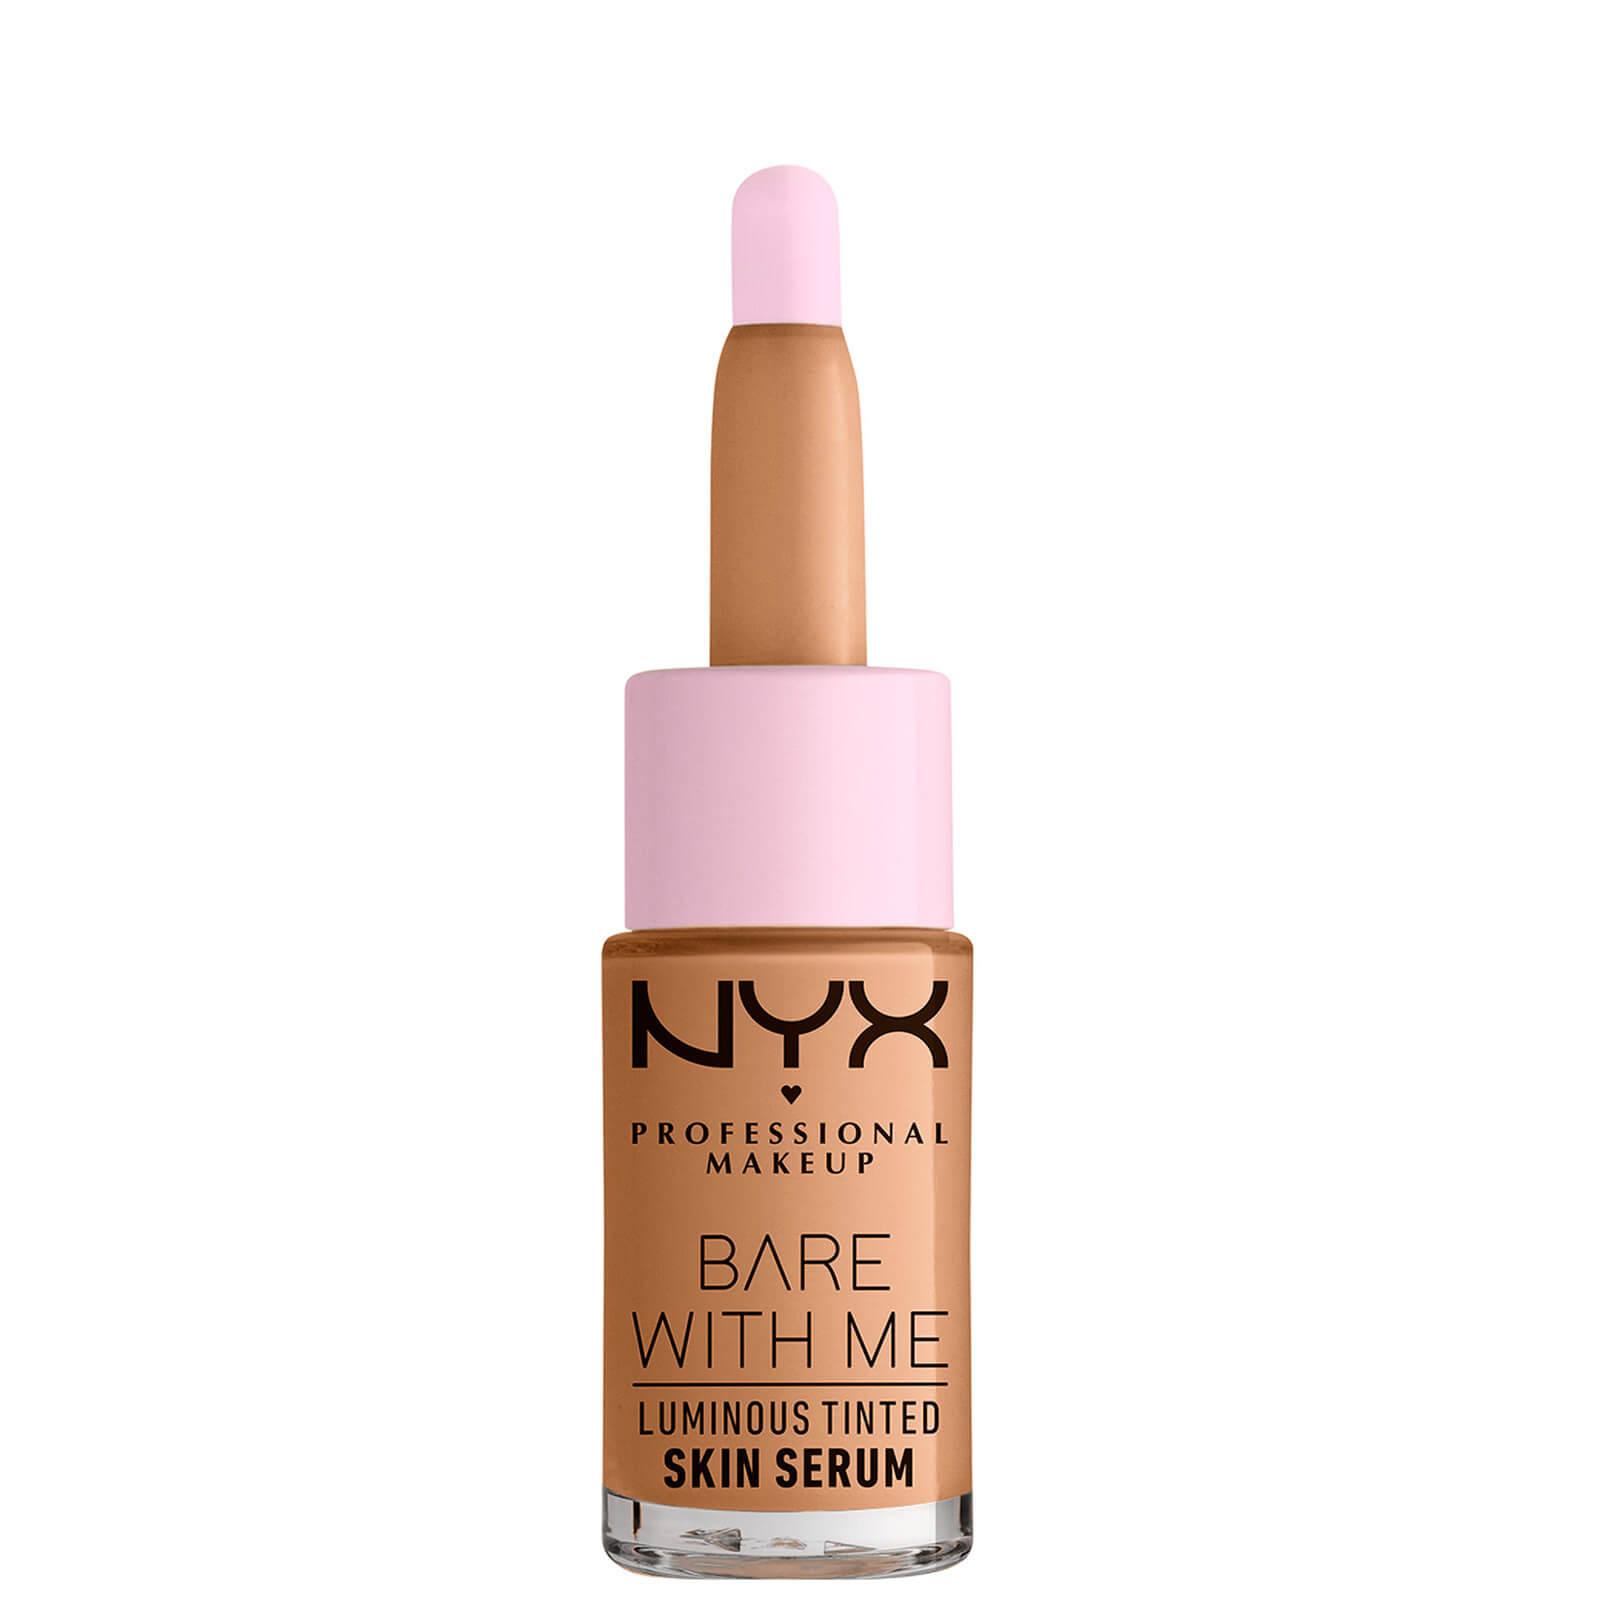 Купить NYX Professional Makeup Bare With Me Luminous Tinted Skin Serum 12.6g (Various Shades) - Medium